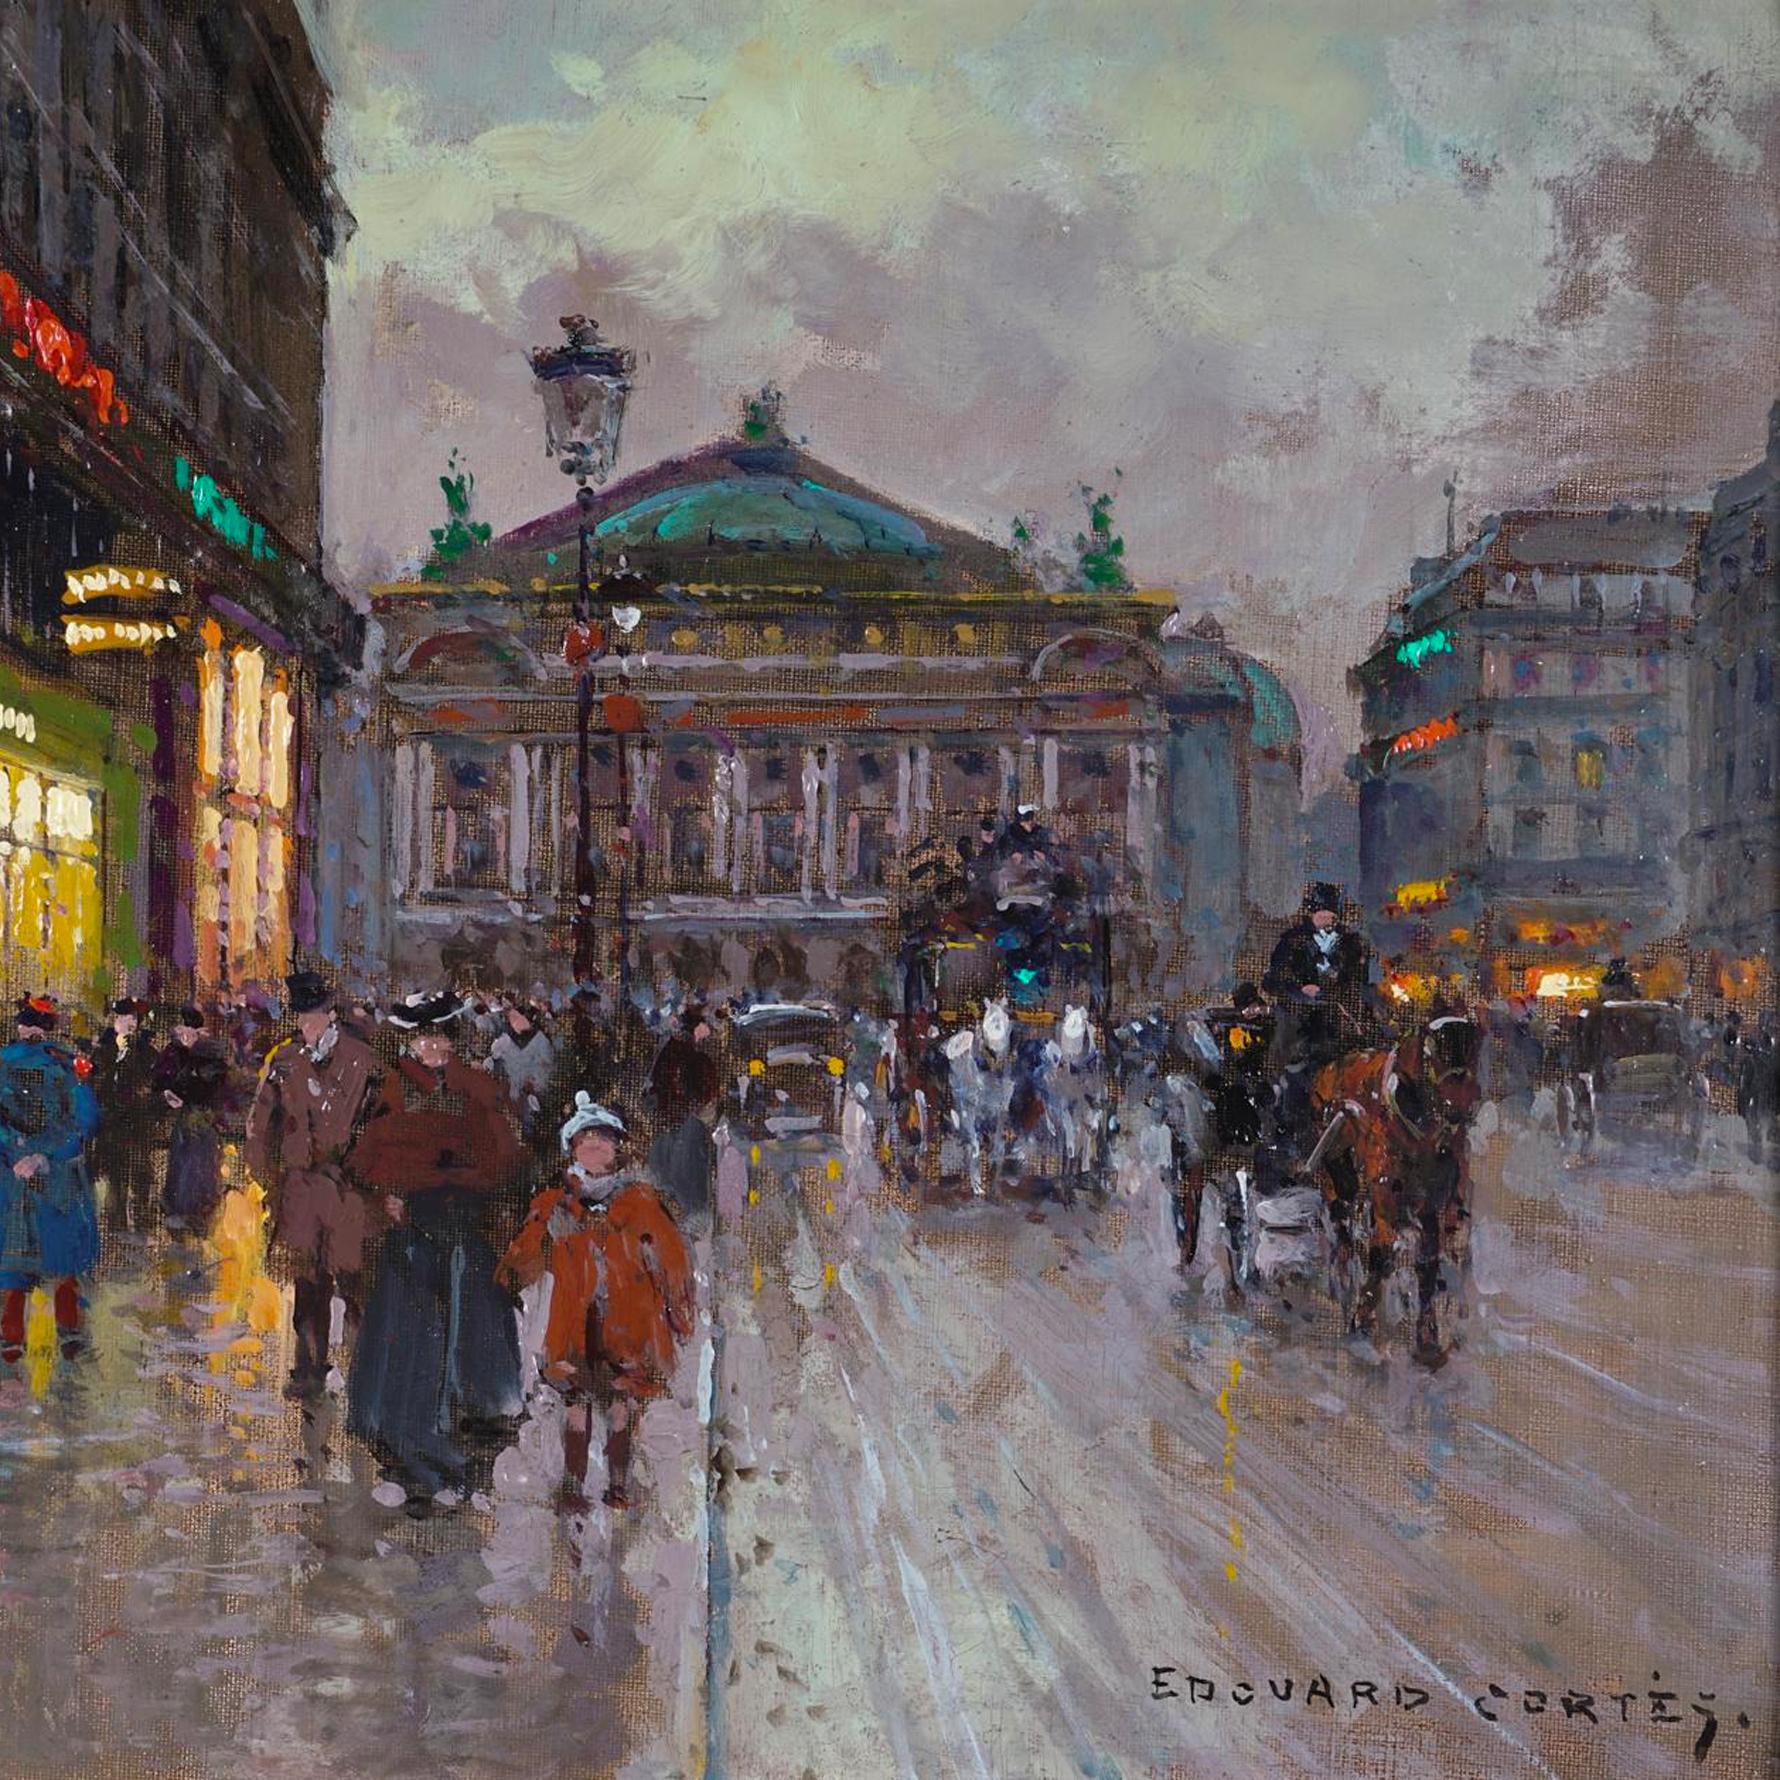 Artist Profile: Edouard Cortes and Raymond Thibesart